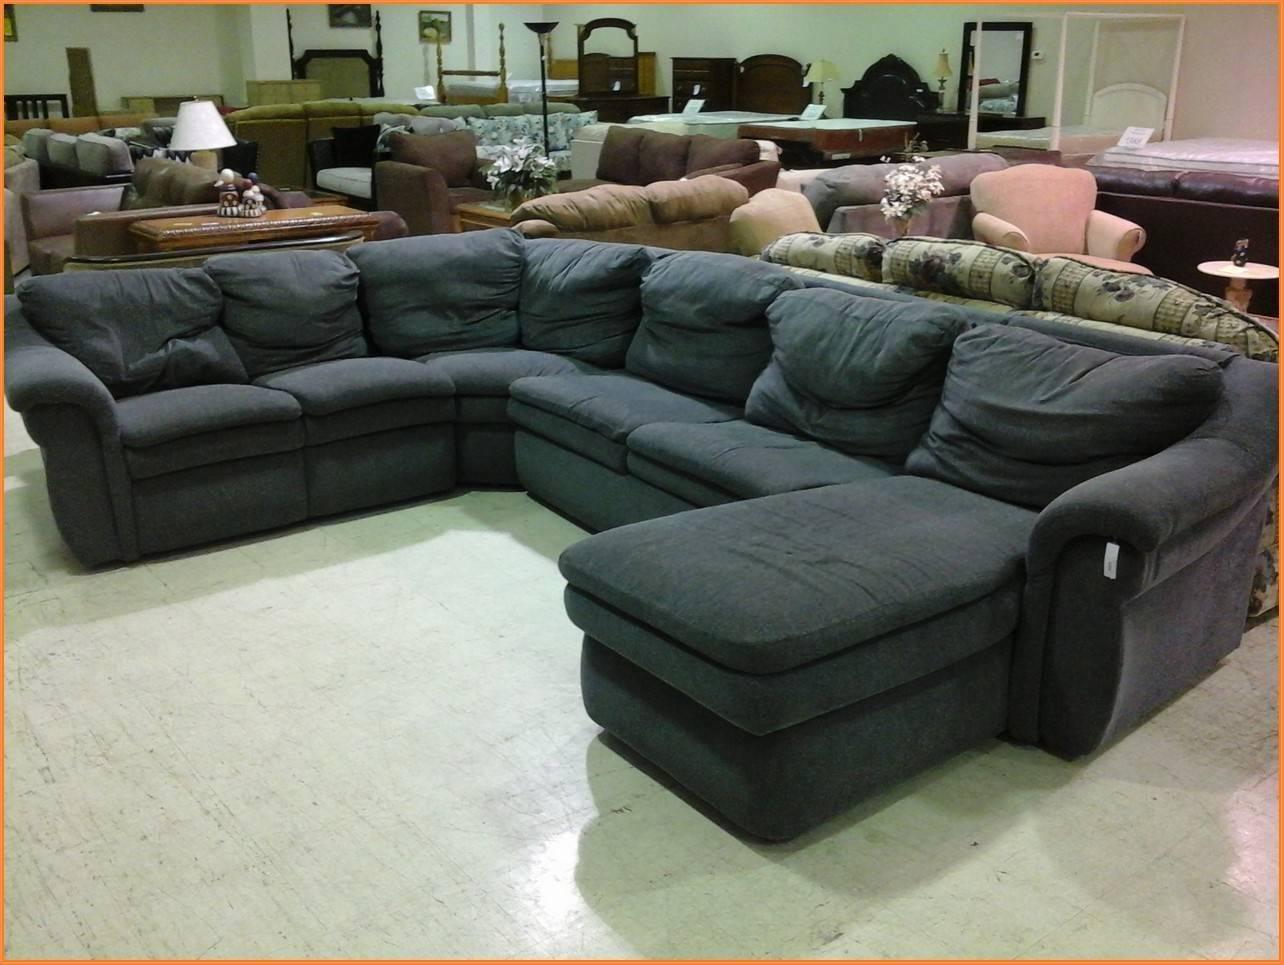 Sofas Center : Inspirational Lazy Boy Sectional Sofa In Office Within Lazyboy Sectional Sofa (Image 17 of 20)